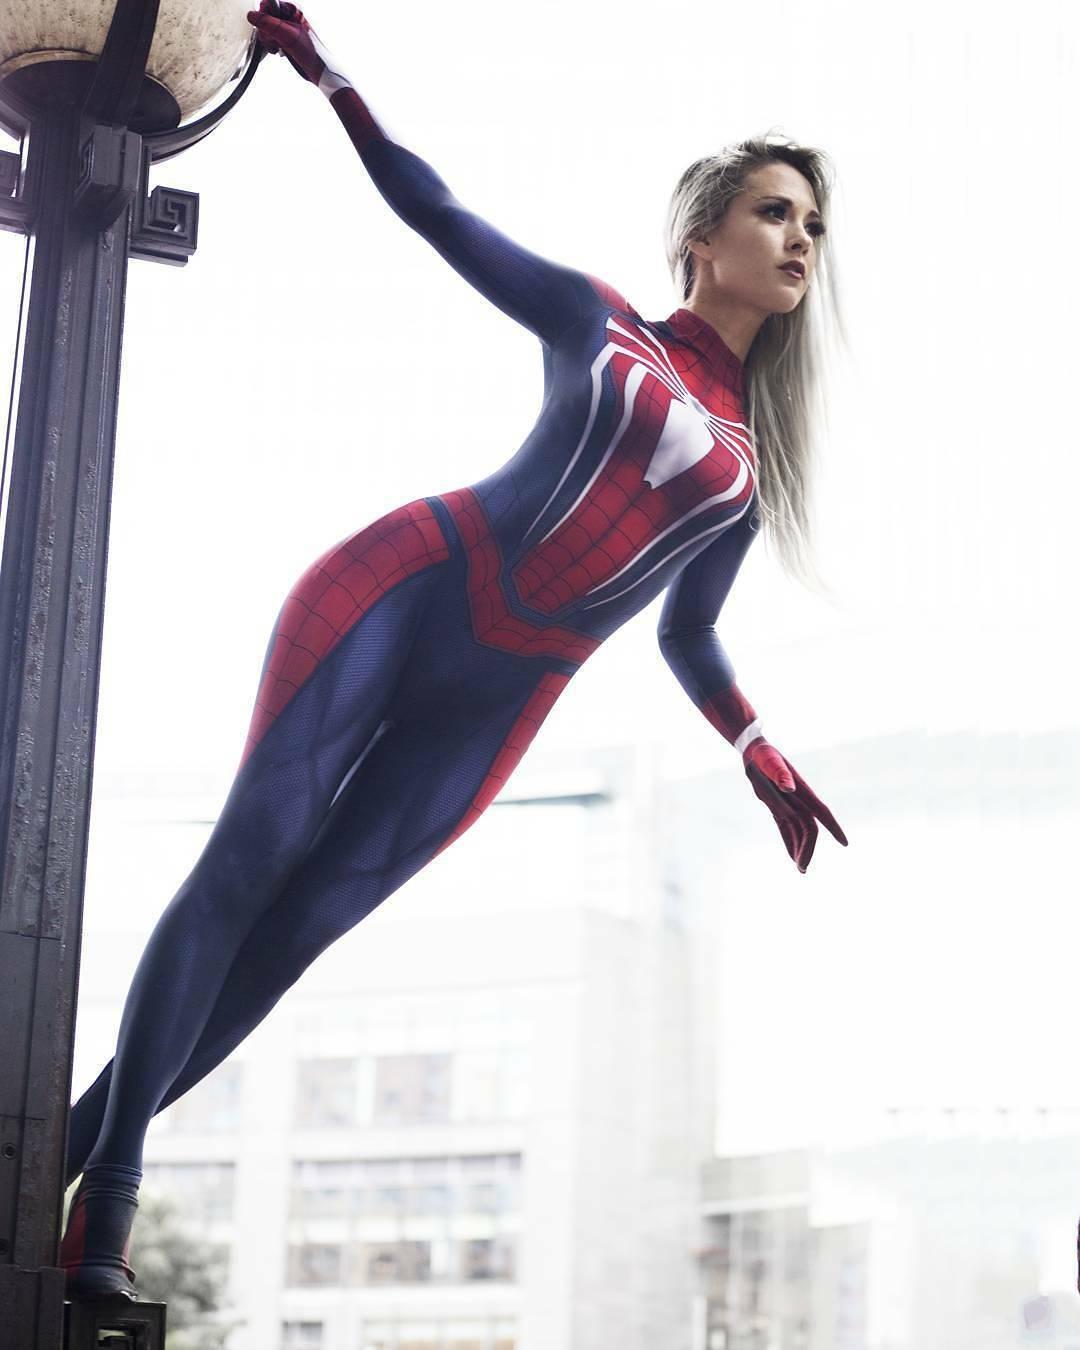 spiderman cosplay hendoart – photo nerdypictures